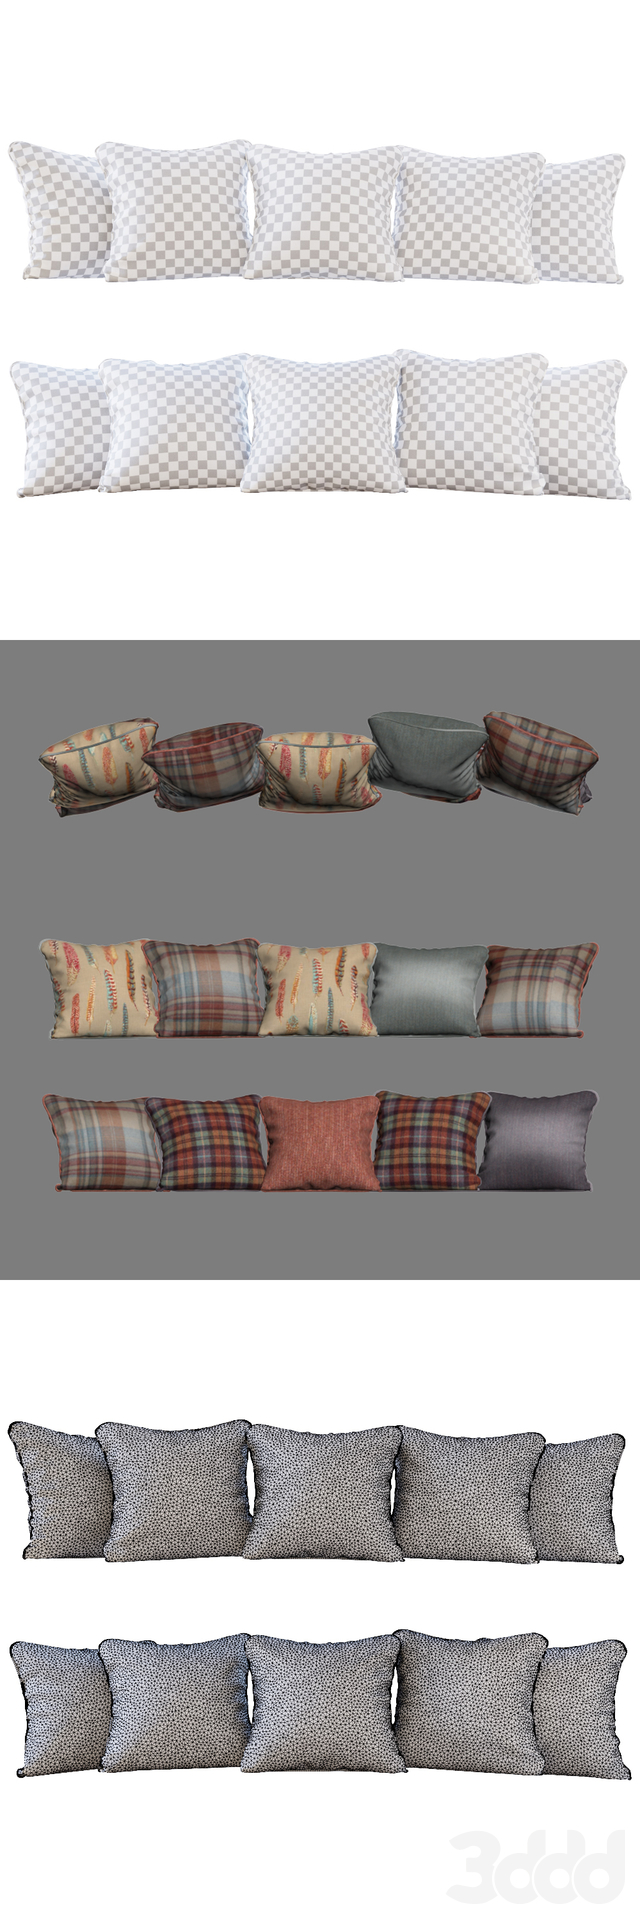 Набор подушек с тканями  Sanderson 01 (Pillows Sanderson 01 YOU)